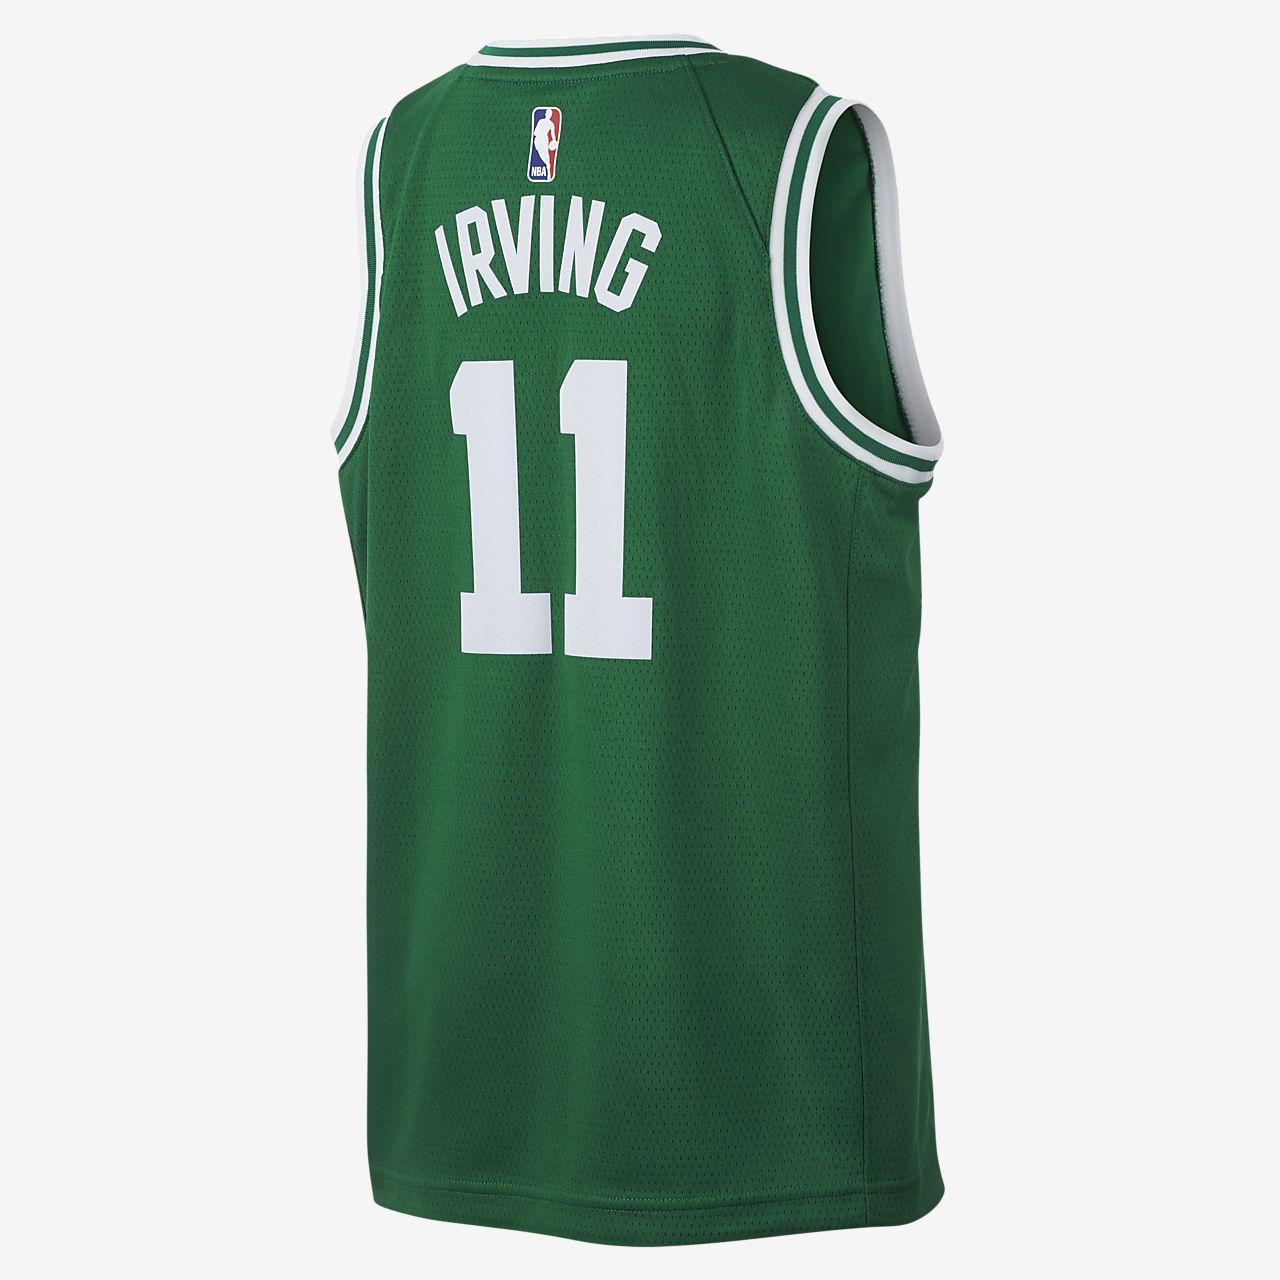 online store ddaaf dd1e9 Kyrie Irving Boston Celtics Nike Icon Edition Swingman NBA-Trikot für Kinder